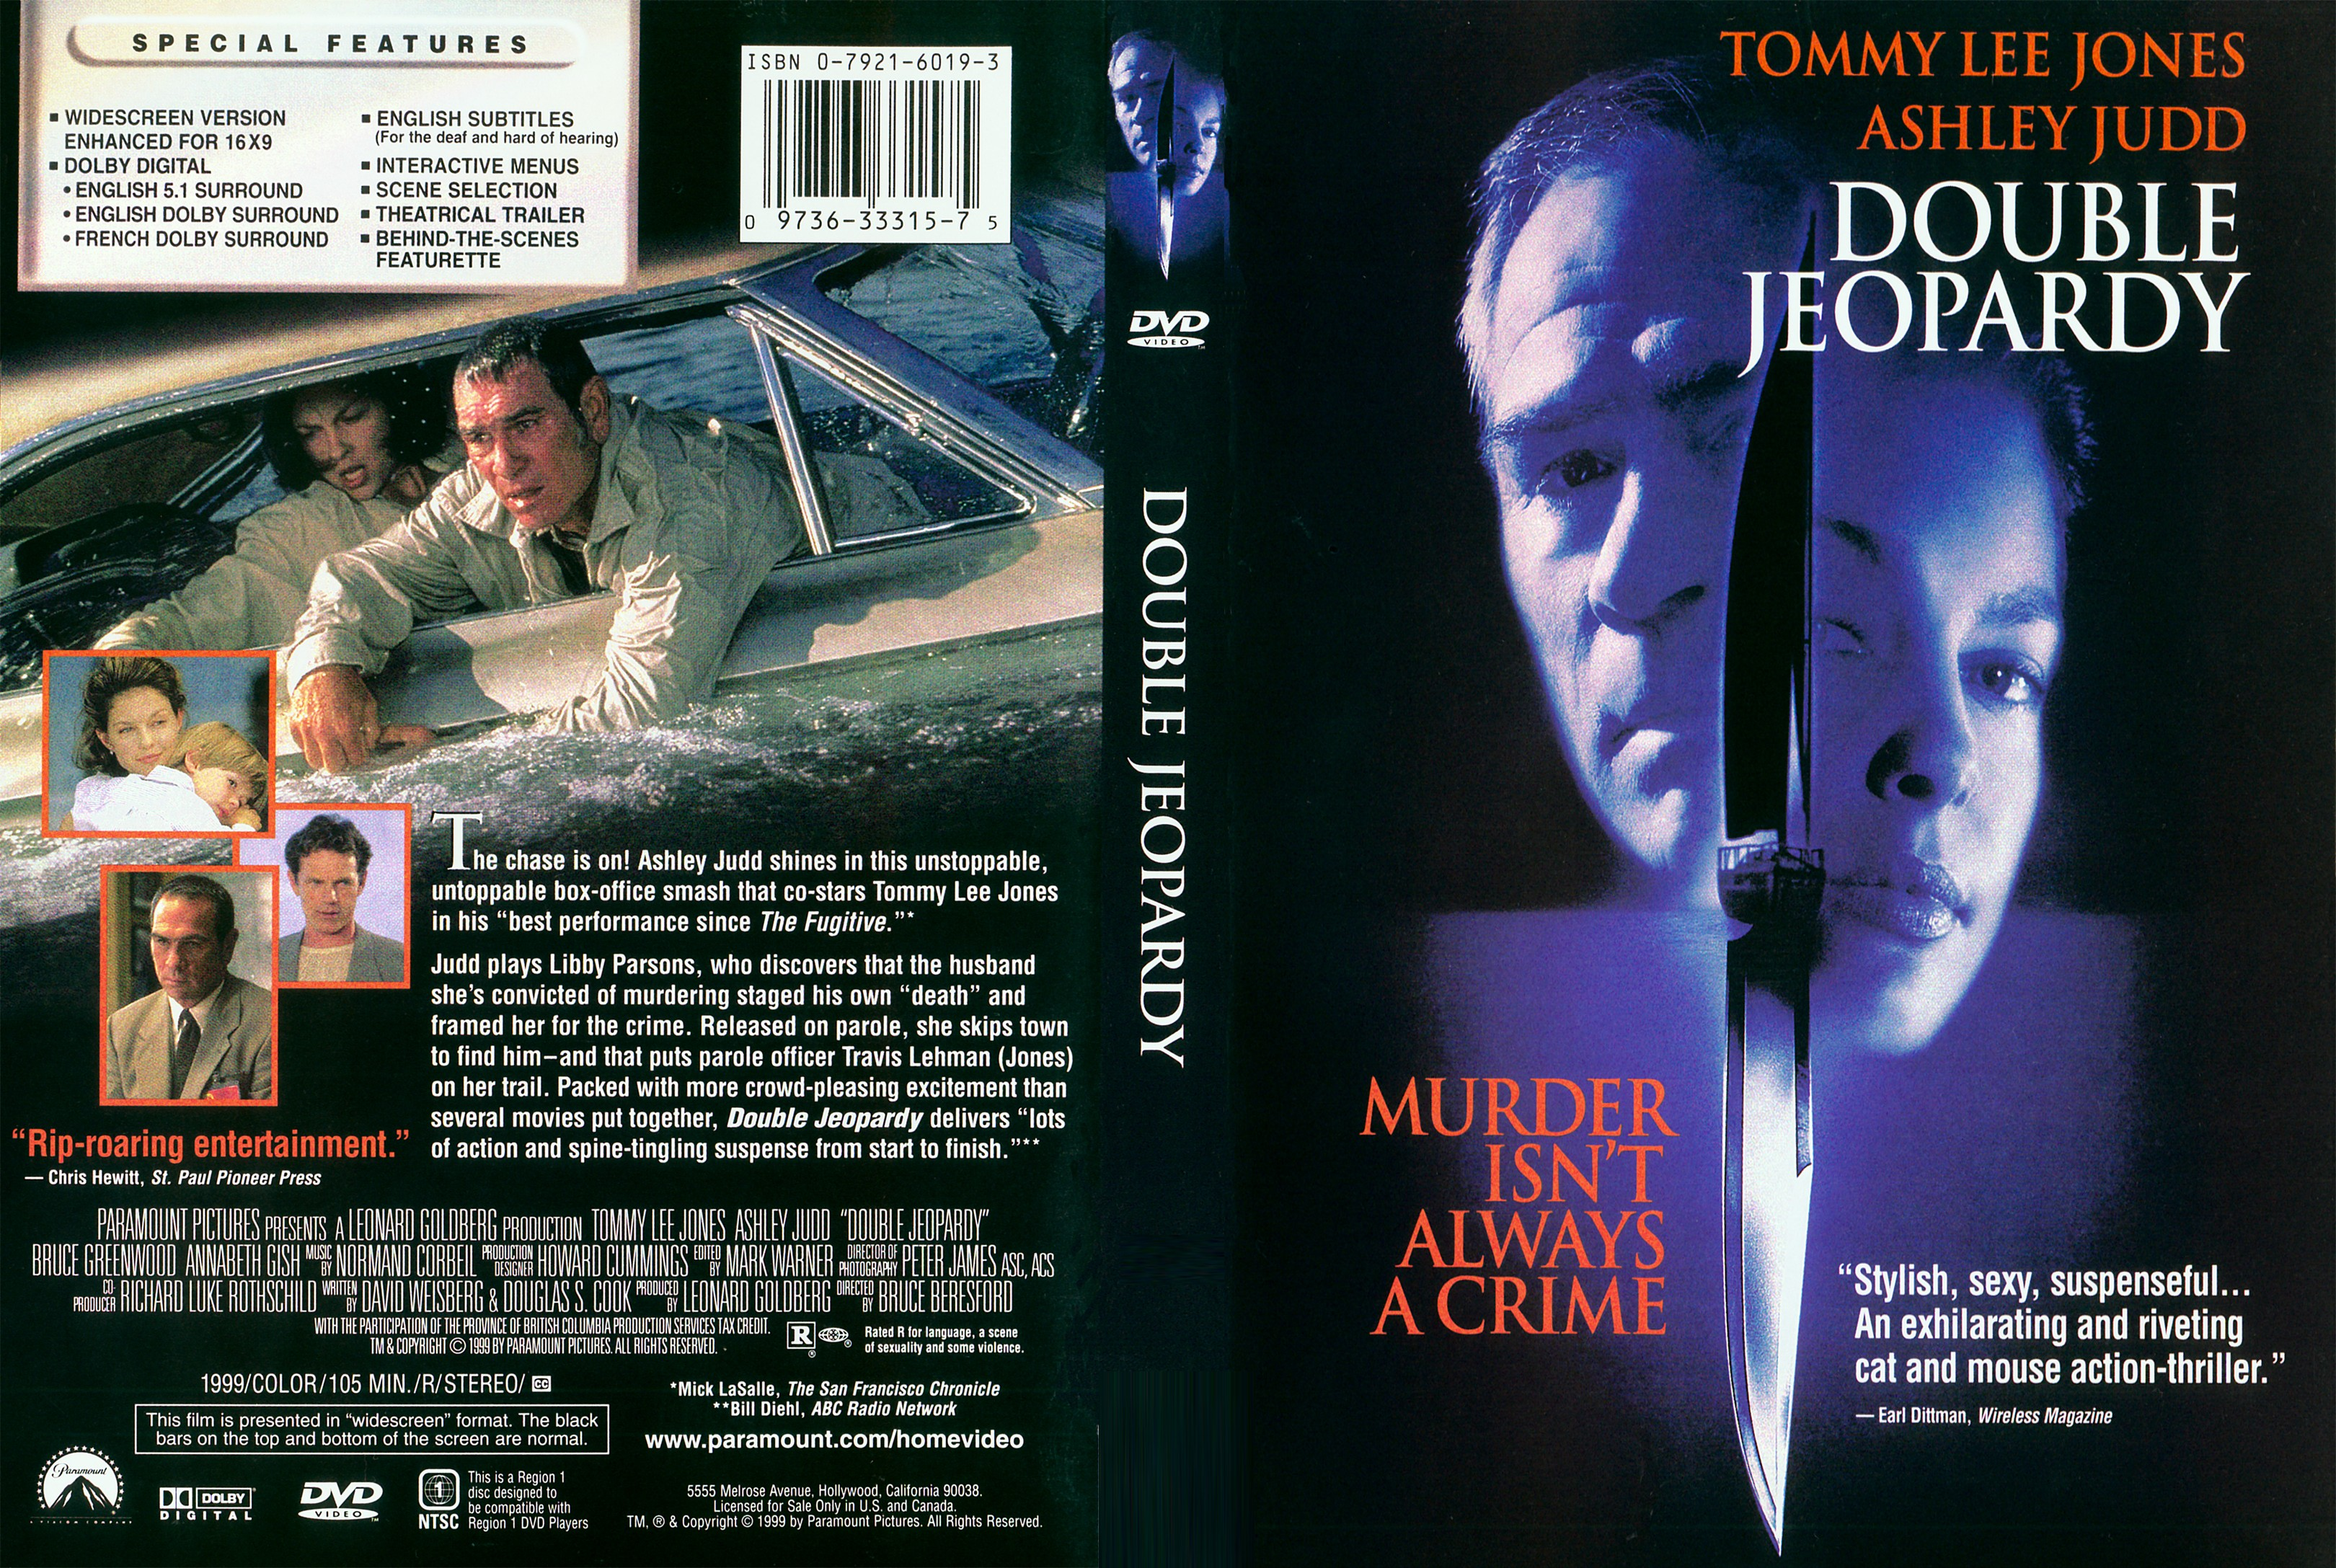 Double jepordy the movie